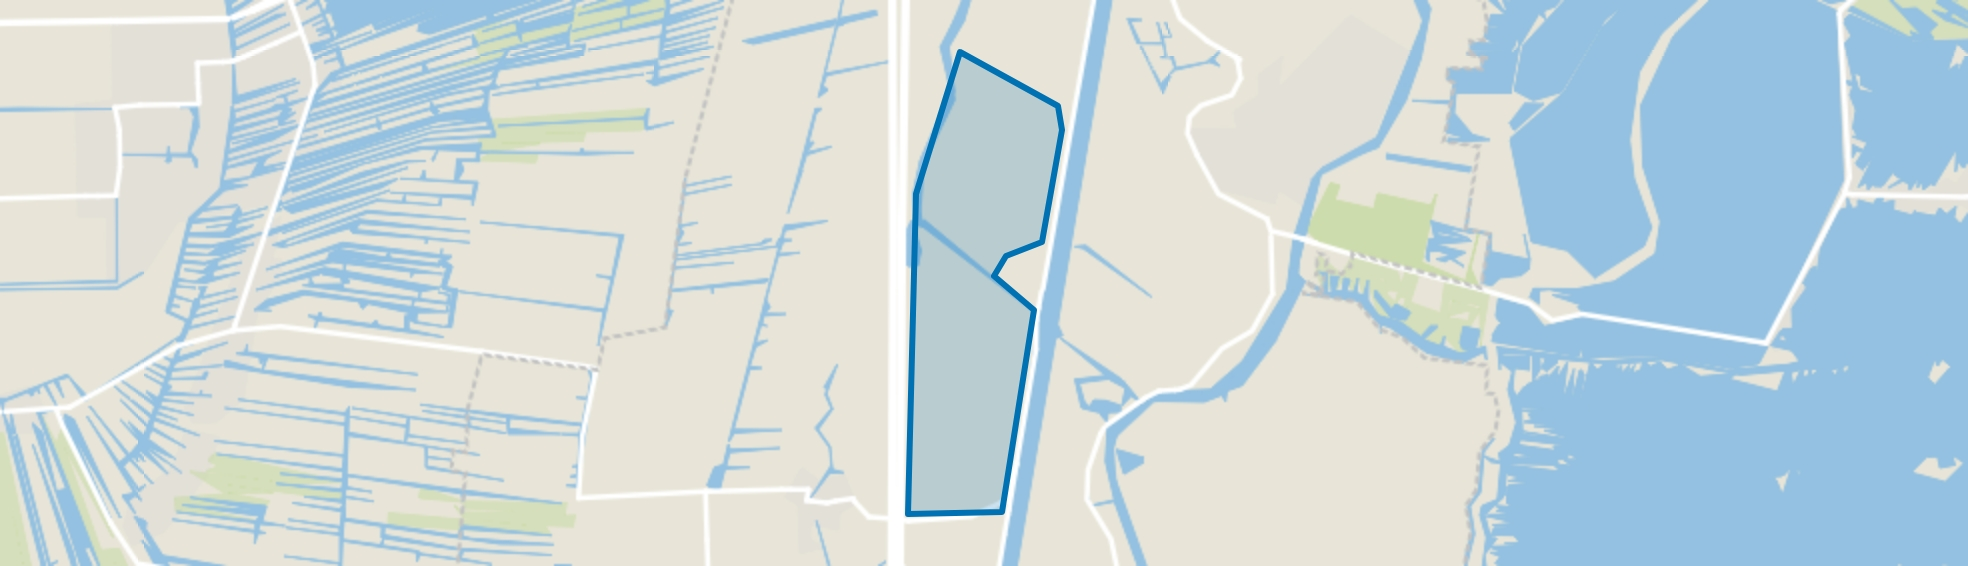 Polder Angstelkade, Nieuwersluis map